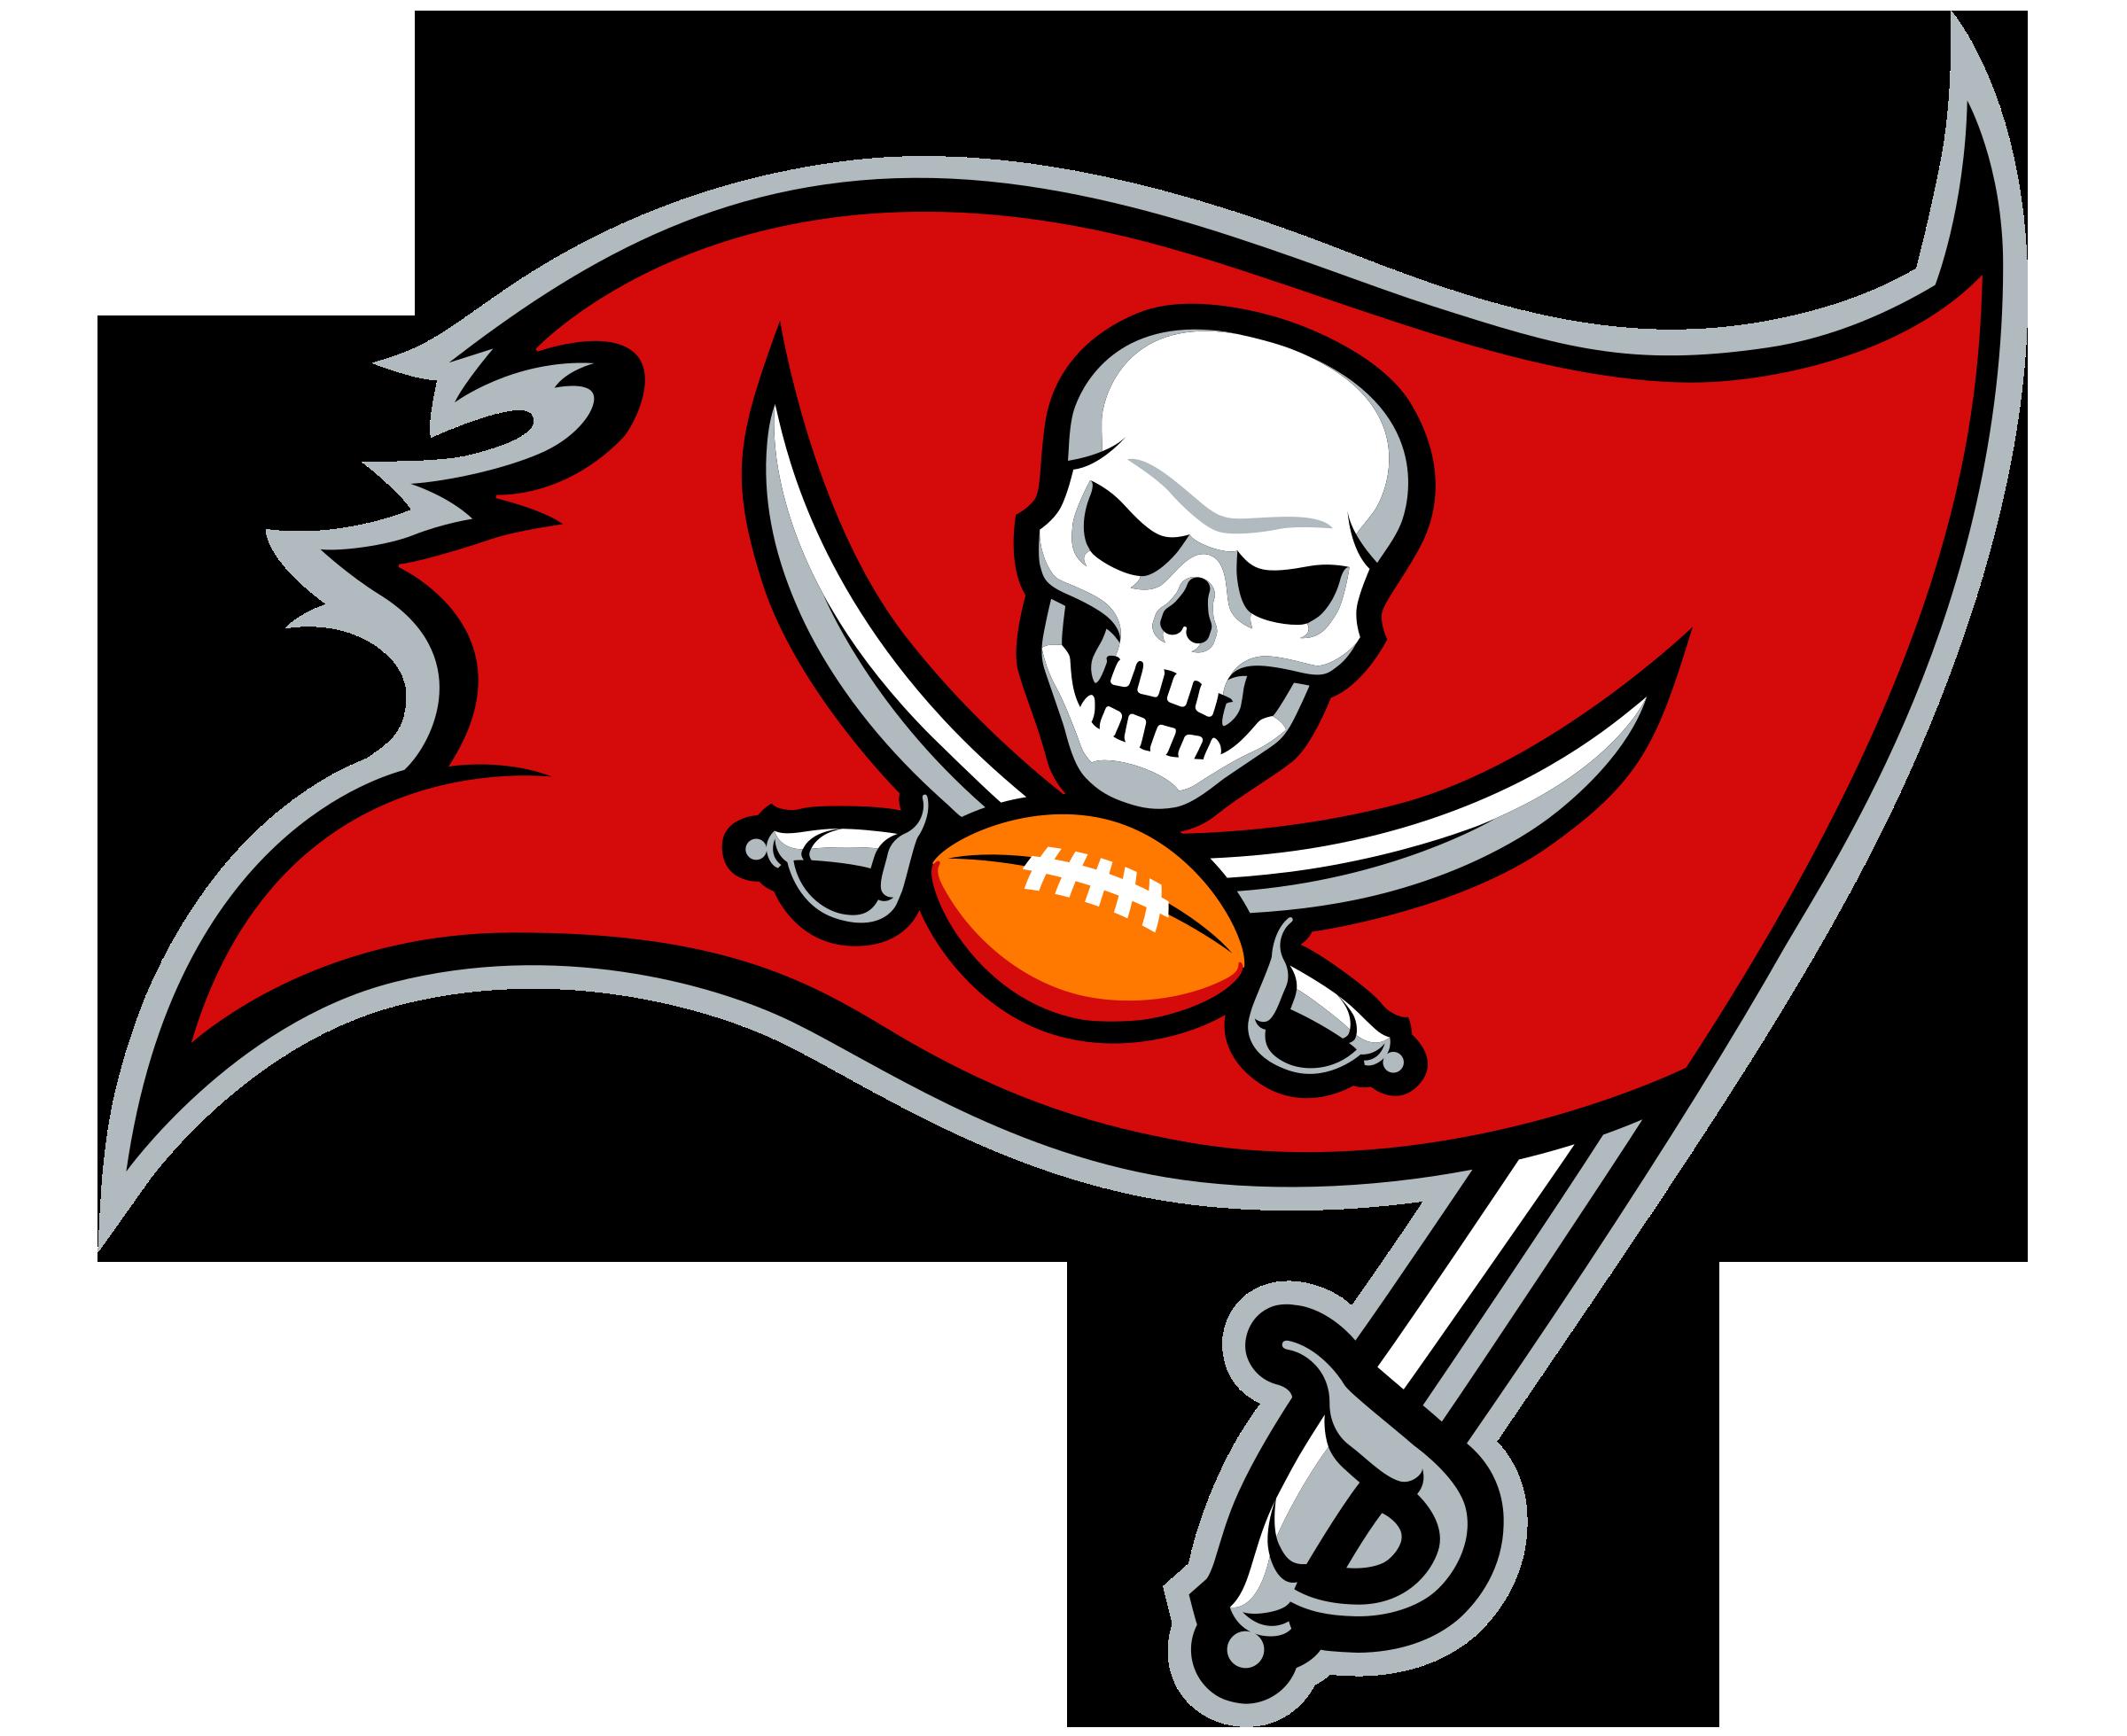 Tampa Bay Buccaneers Logo Transparent Tampa Bay Buccaneers Logo Buccaneers Football Tampa Bay Buccaneers